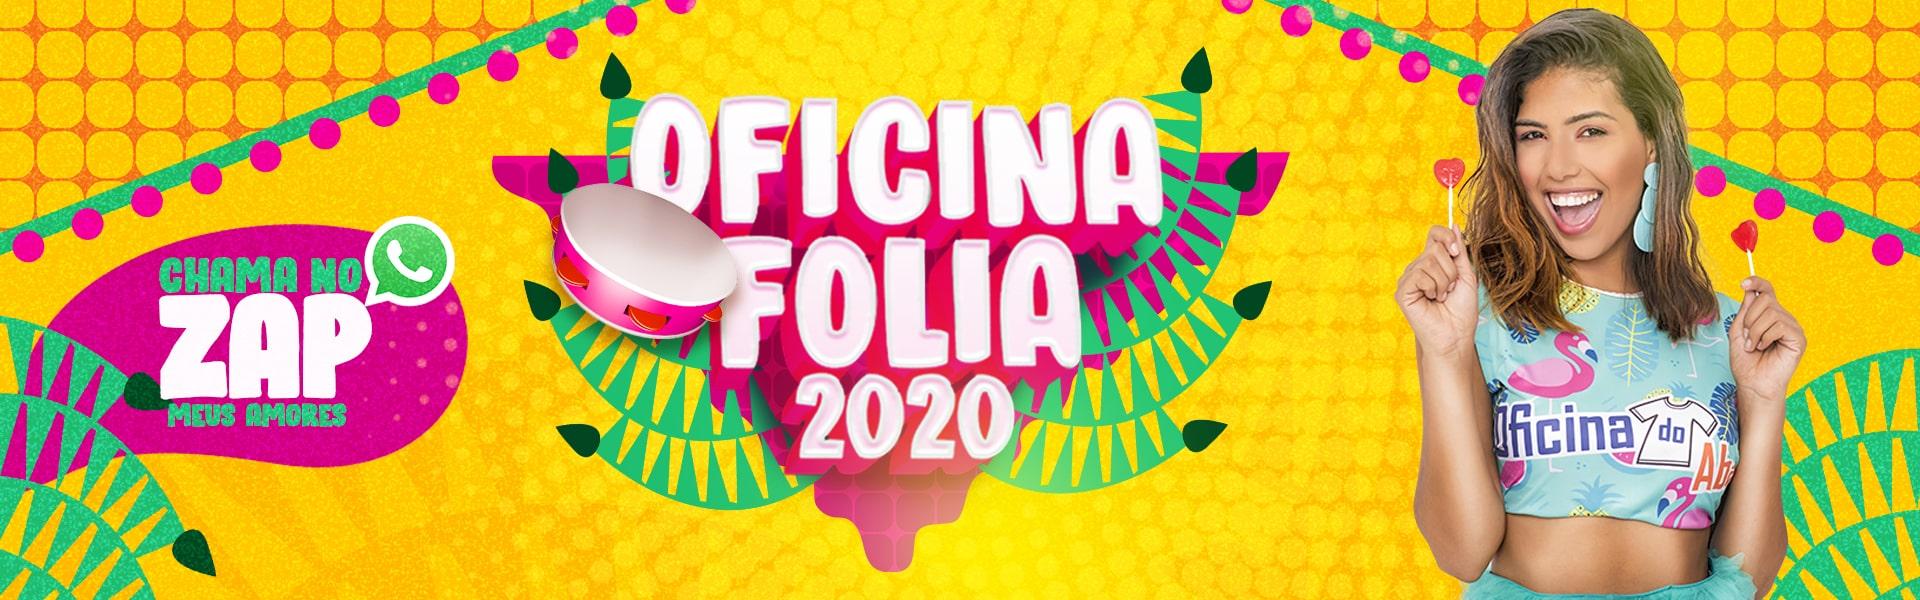 BANNER OFICINA FOLIA SITE-min